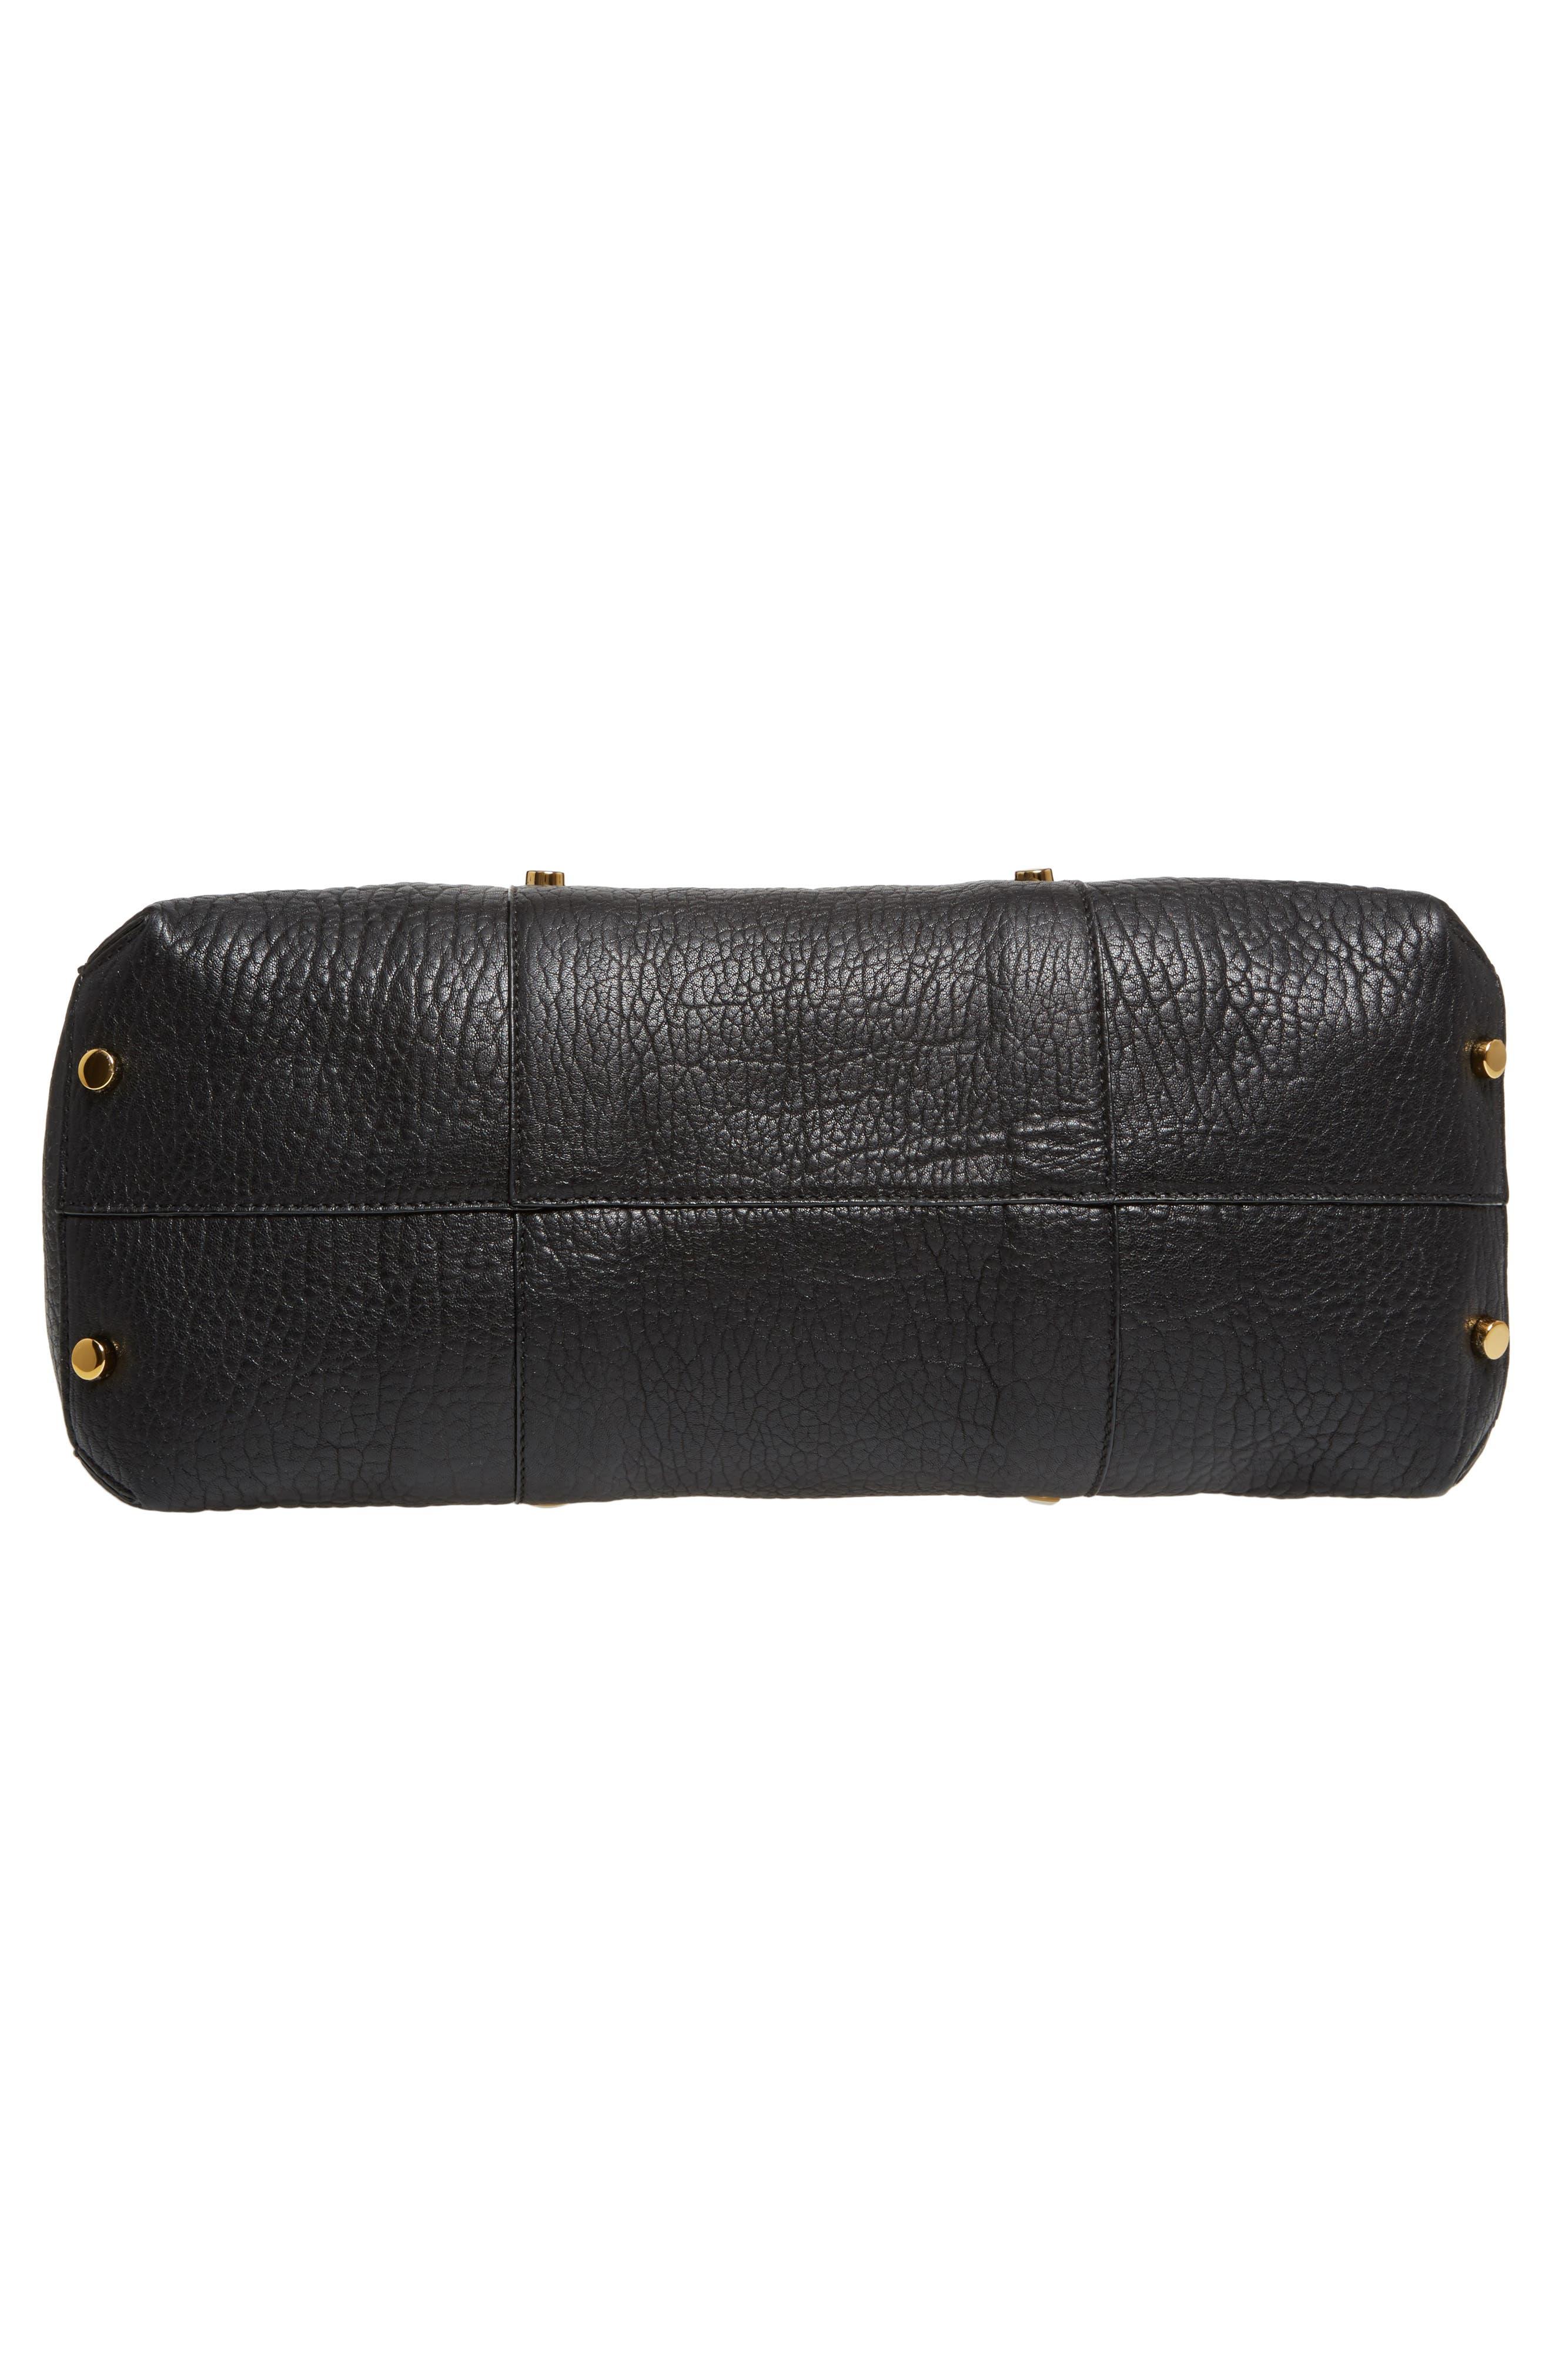 Lockett Leather Shopper,                             Alternate thumbnail 6, color,                             Black